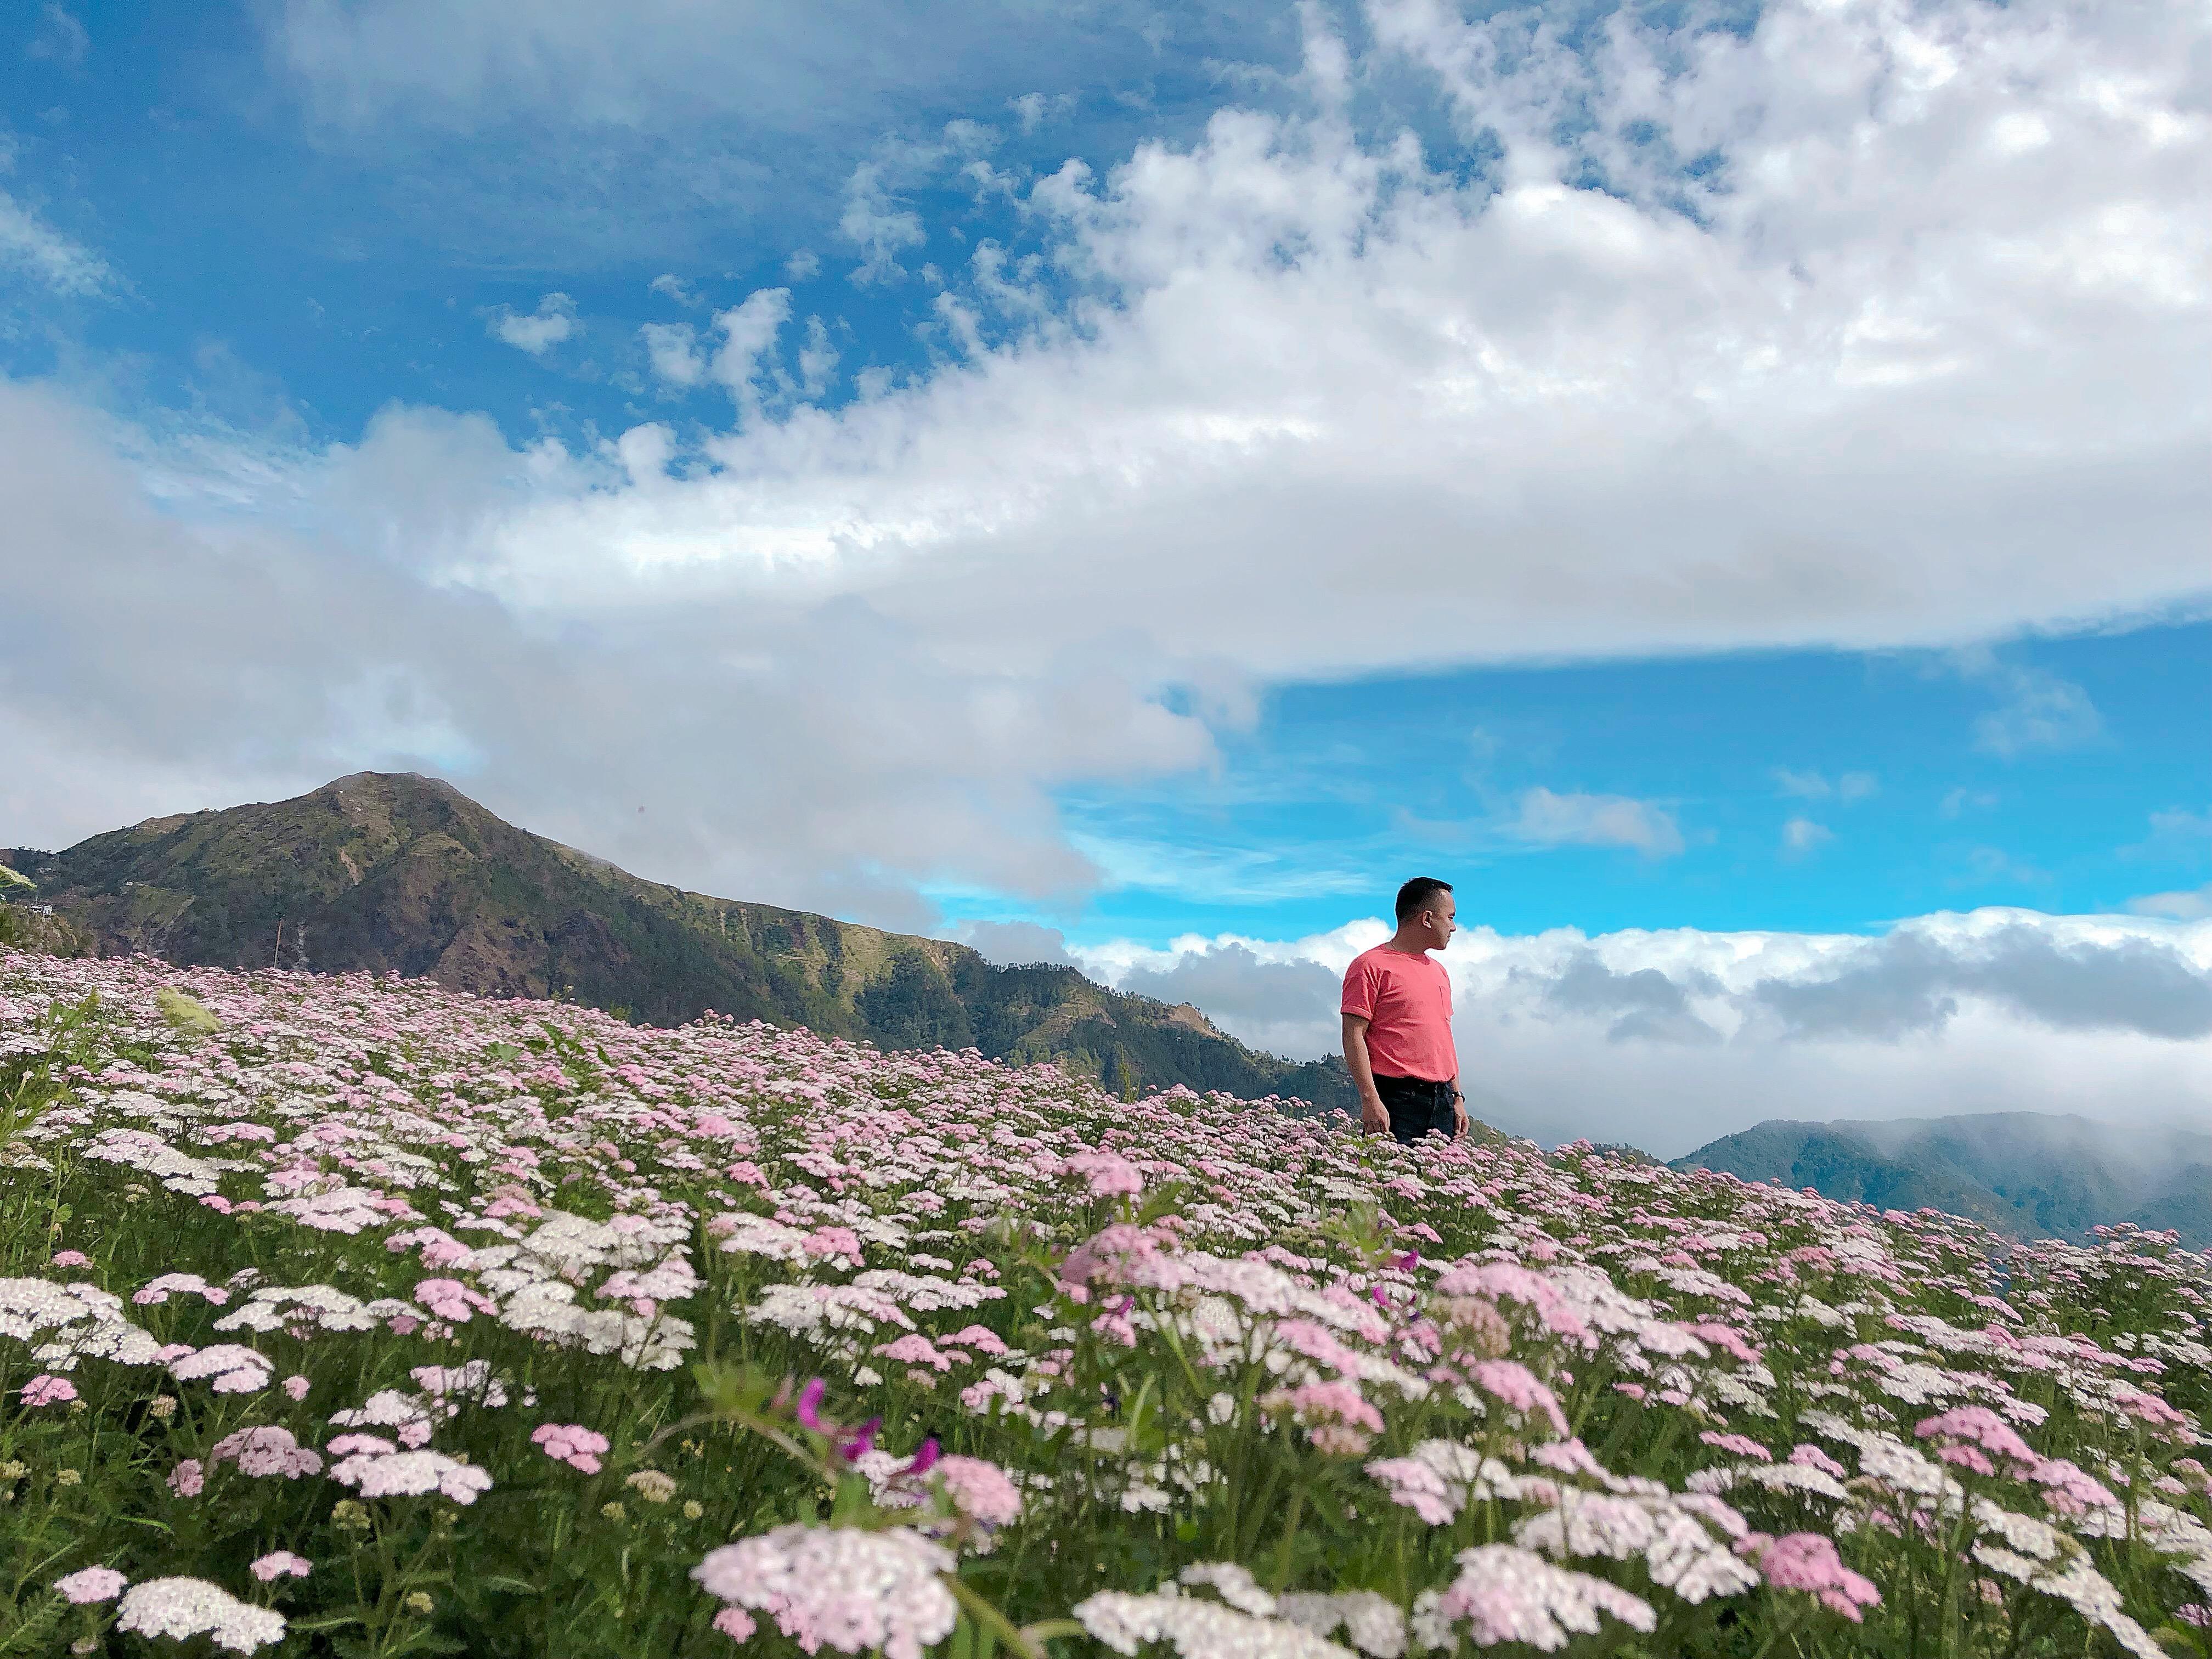 Northern Blossom Flower Farm Atok S Floral Carpet